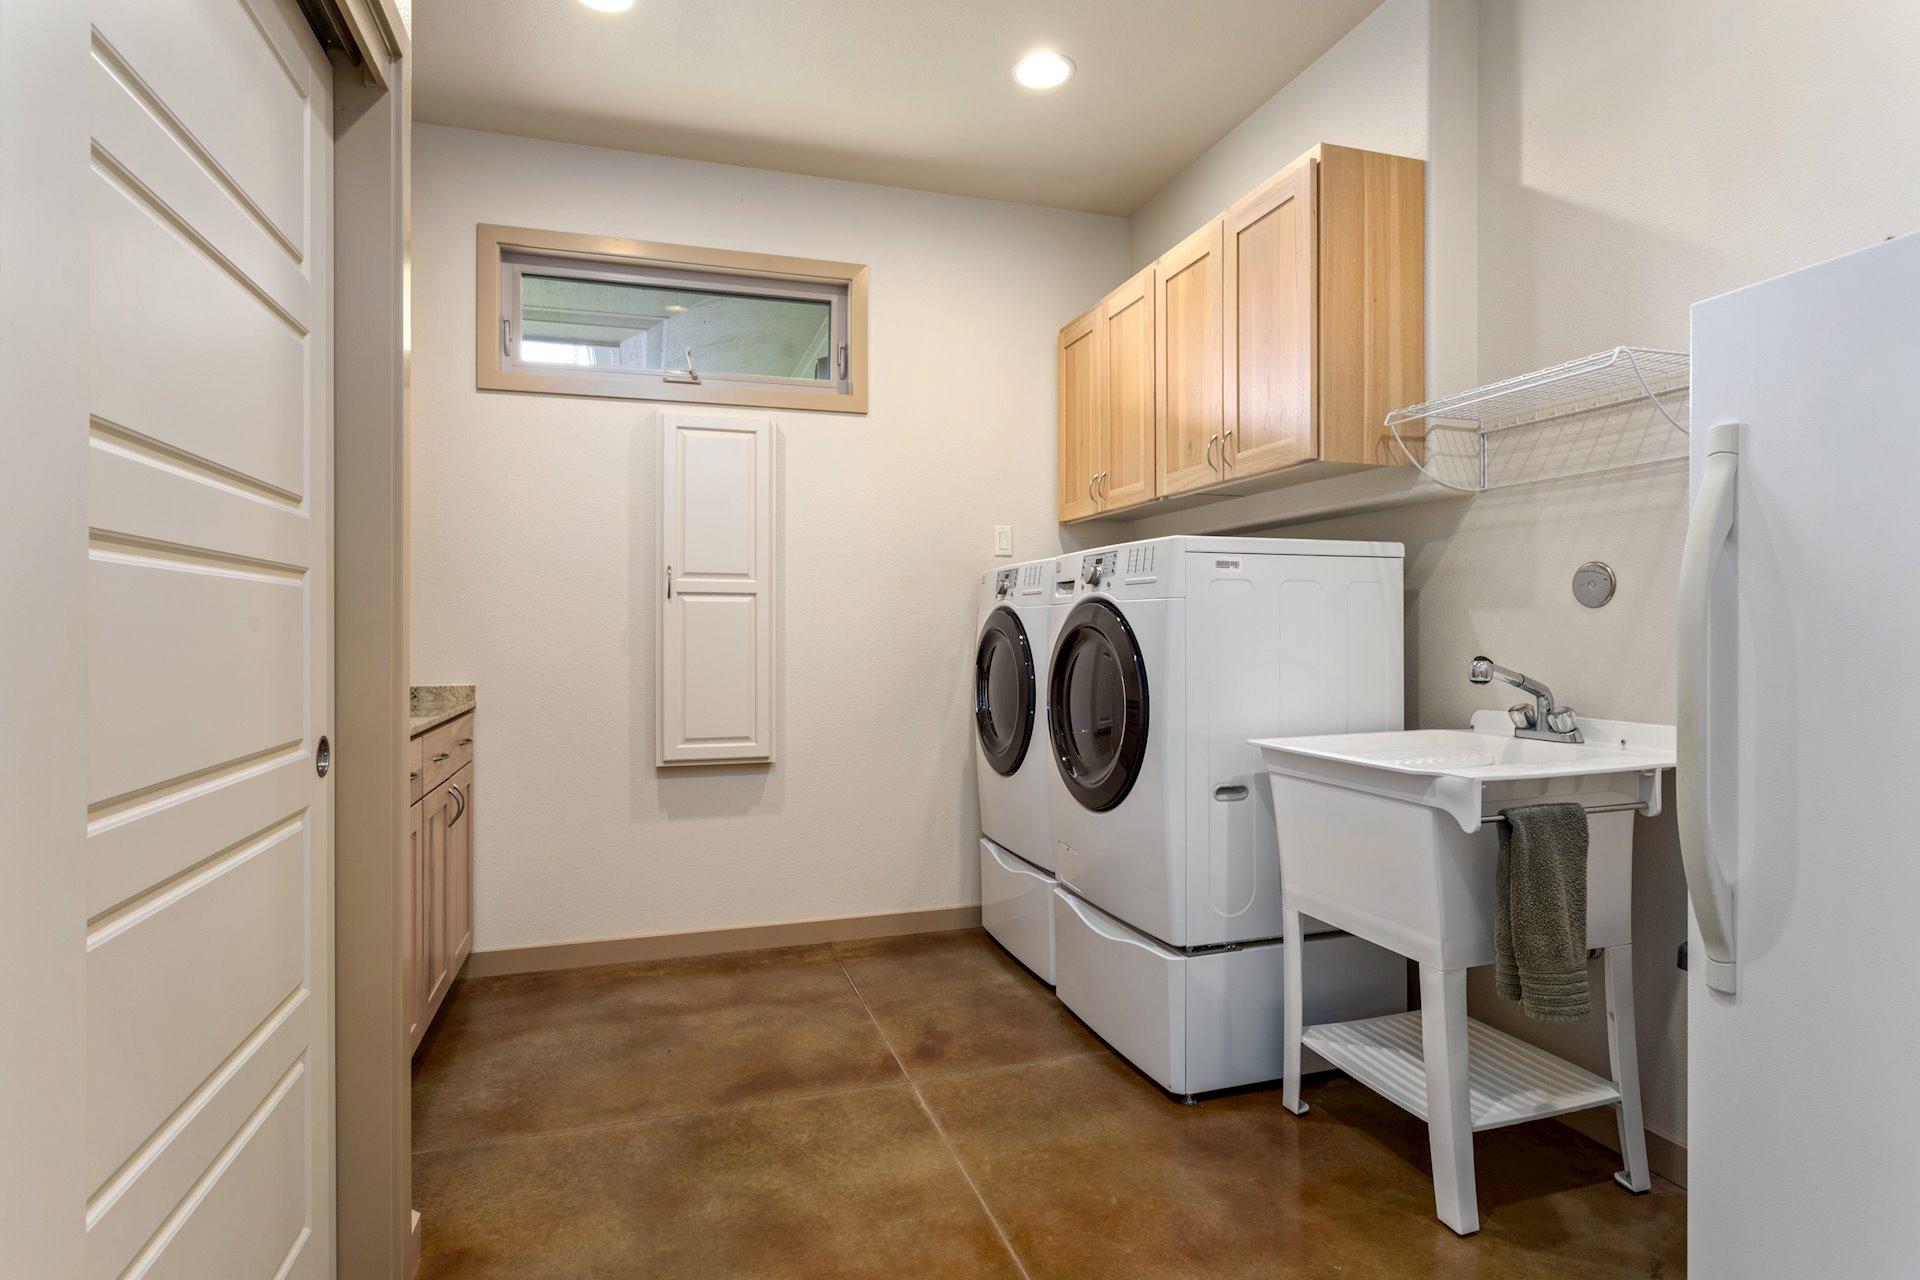 Large laundry room with plenty of storage